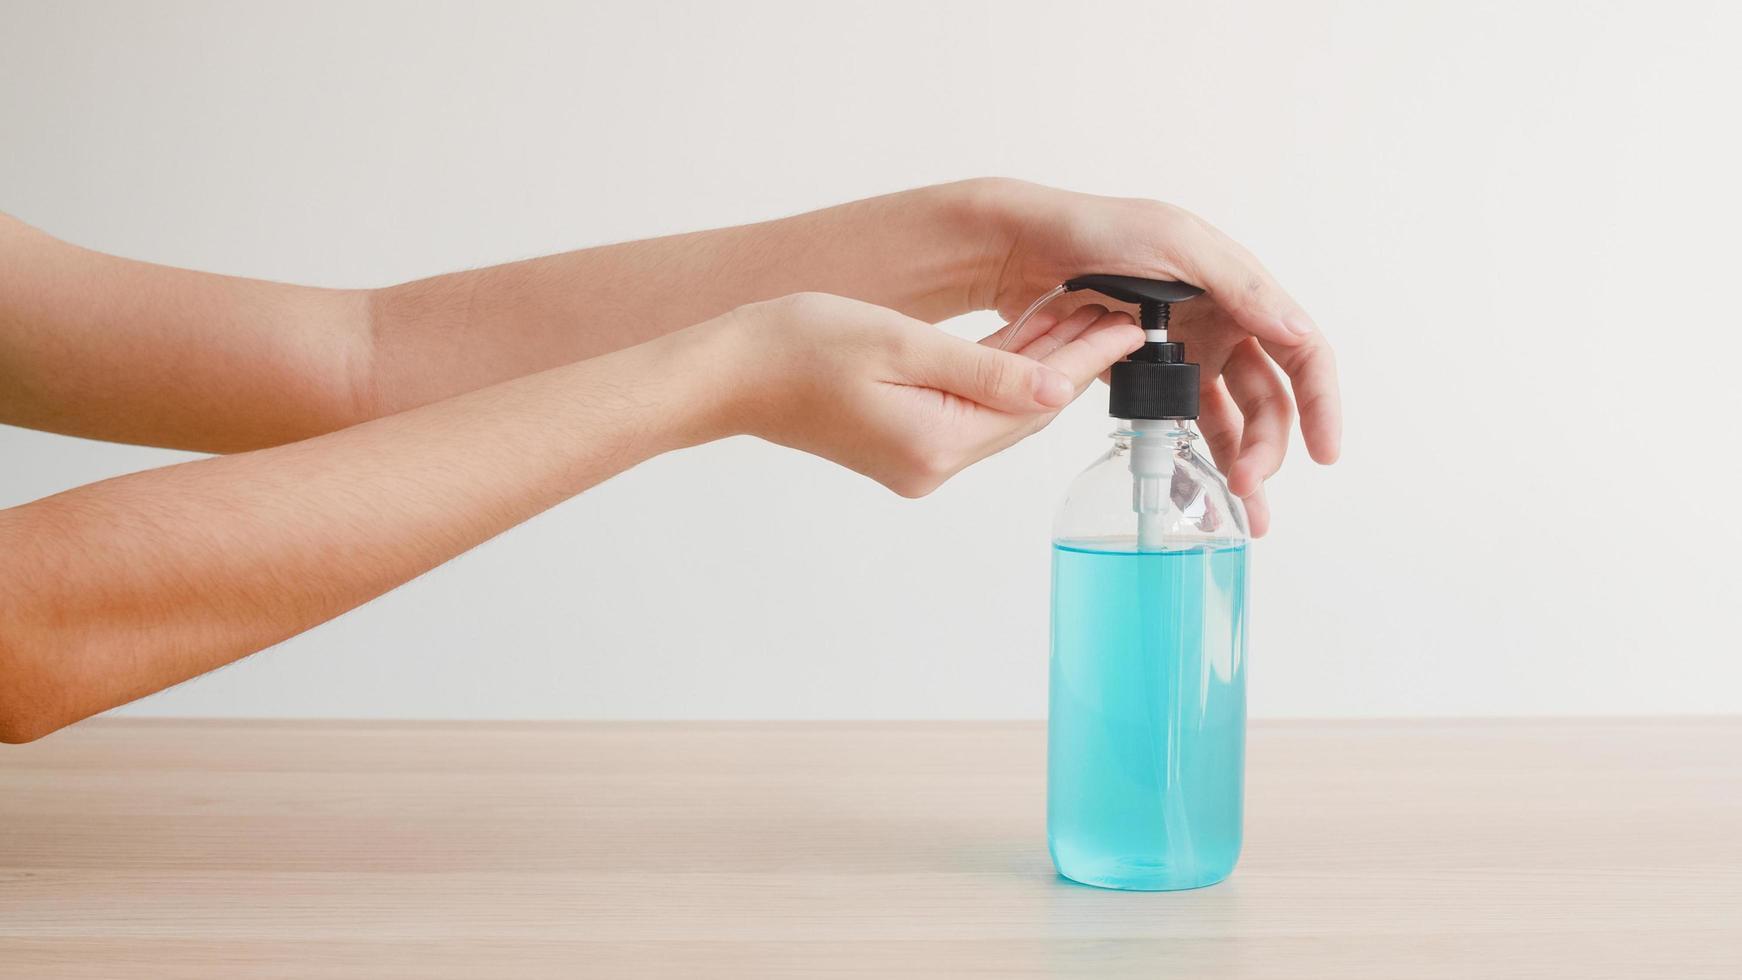 ung asiatisk kvinna som använder alkohol gel hand sanitizer. foto